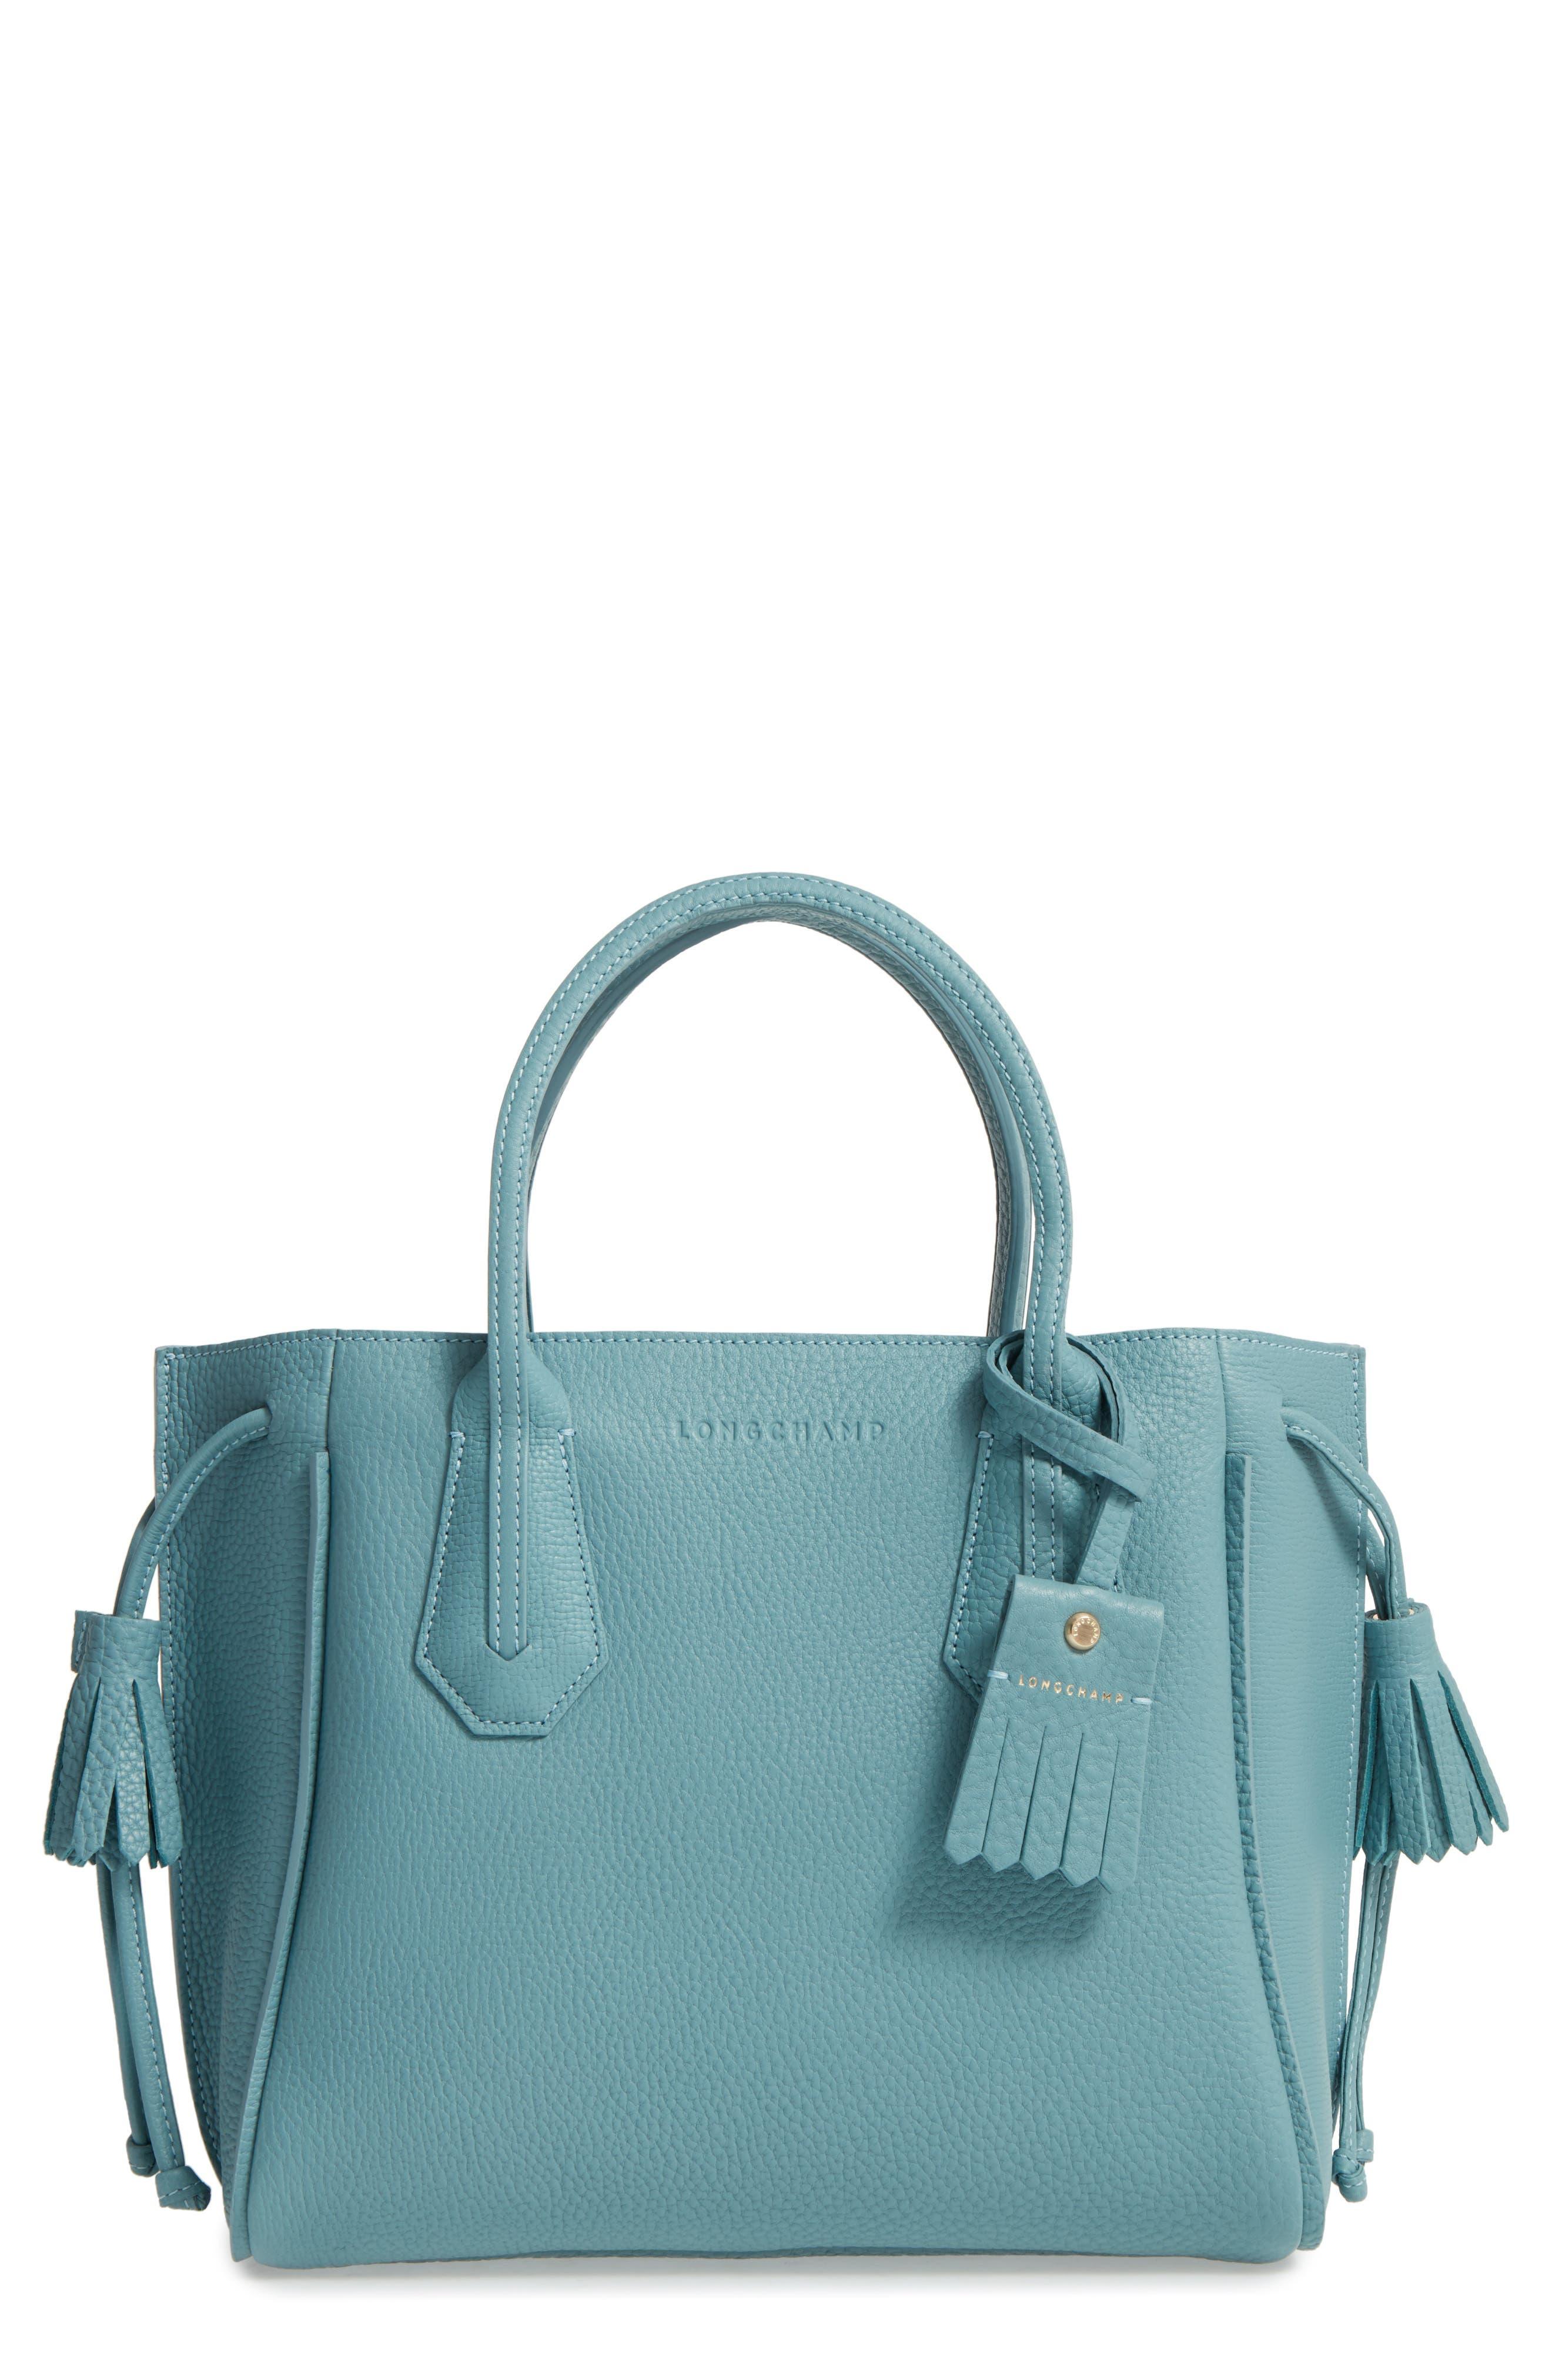 Main Image - Longchamp 'Small Penelope' Leather Tote